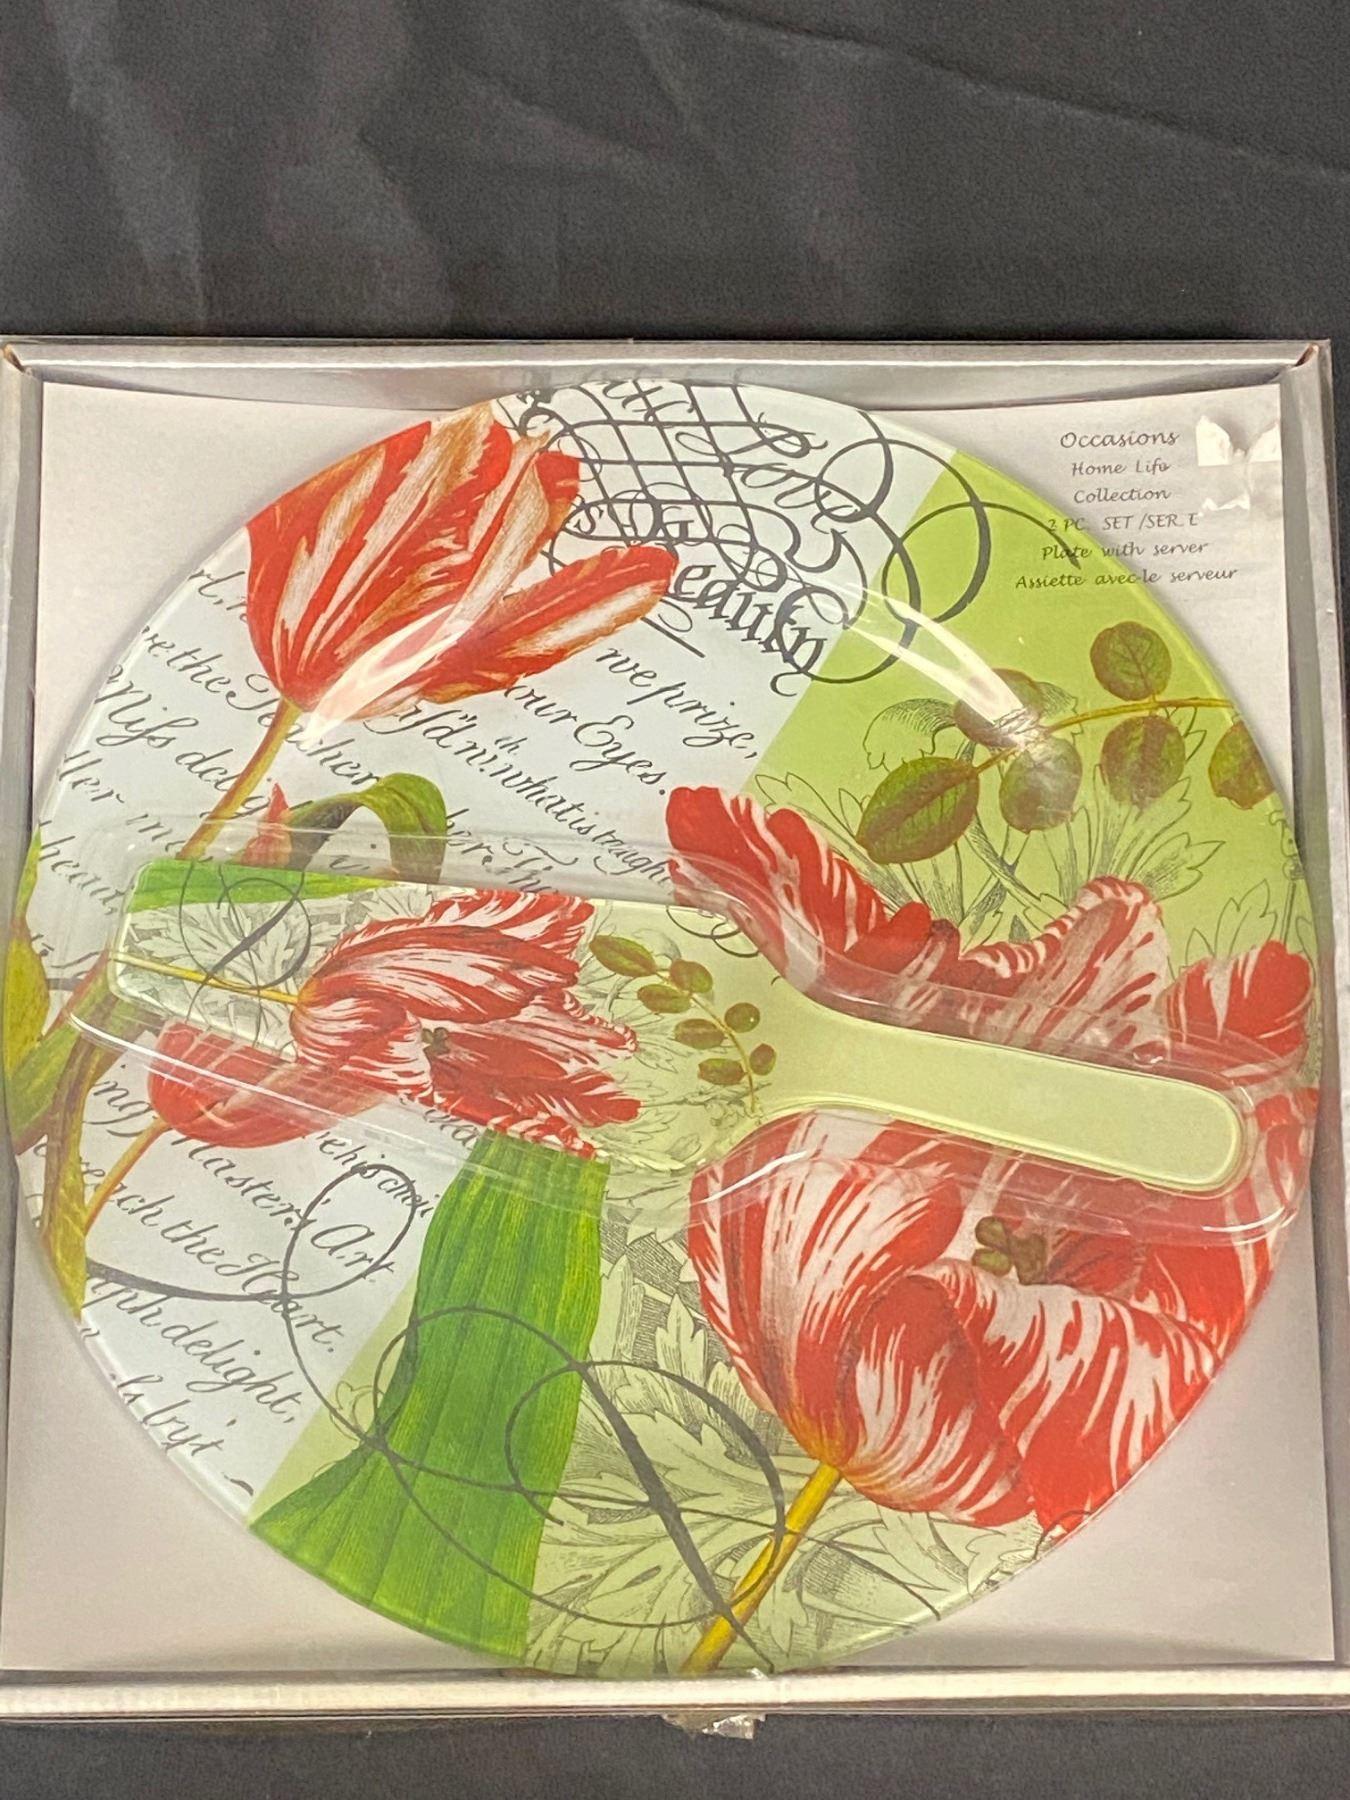 Beautiful  Occasions  Glass Platter w/Lifter